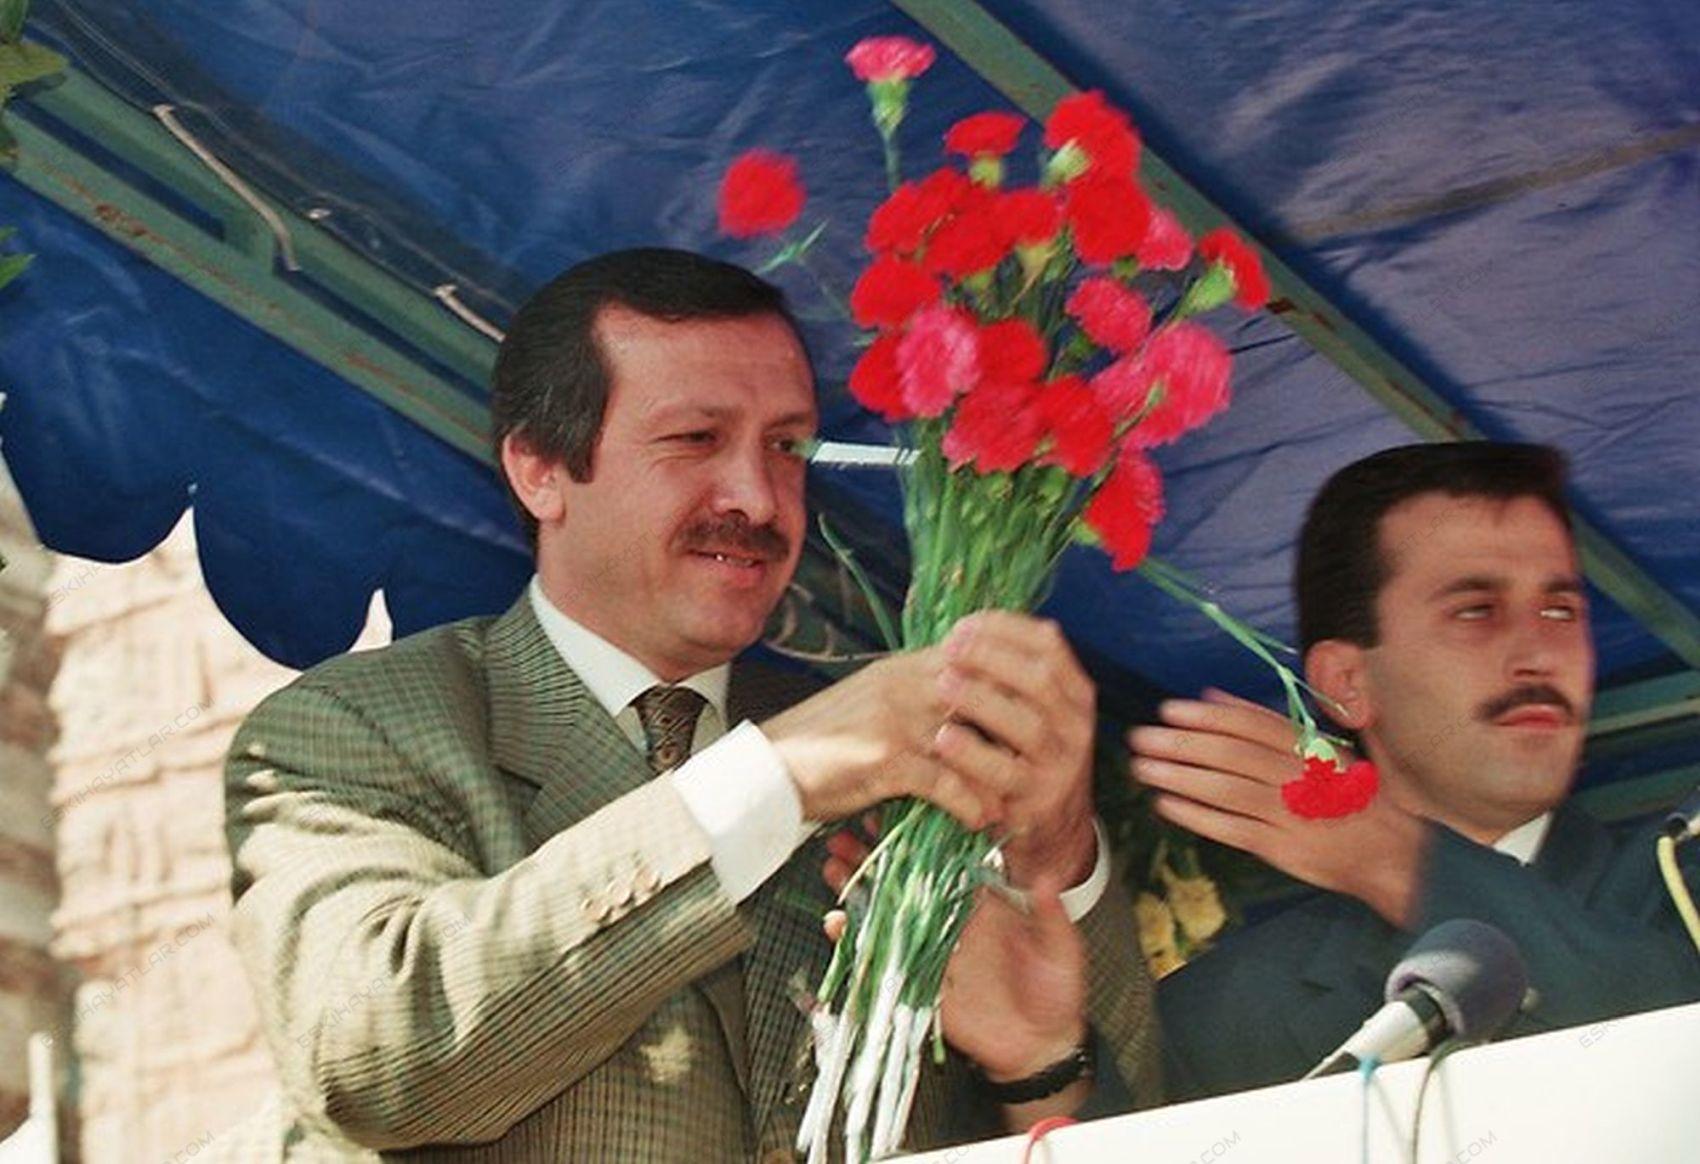 0355-turkiyenin-yeni-umudu-ak-parti-2002-tempo-dergisi-recep-tayyip-erdogan (14)